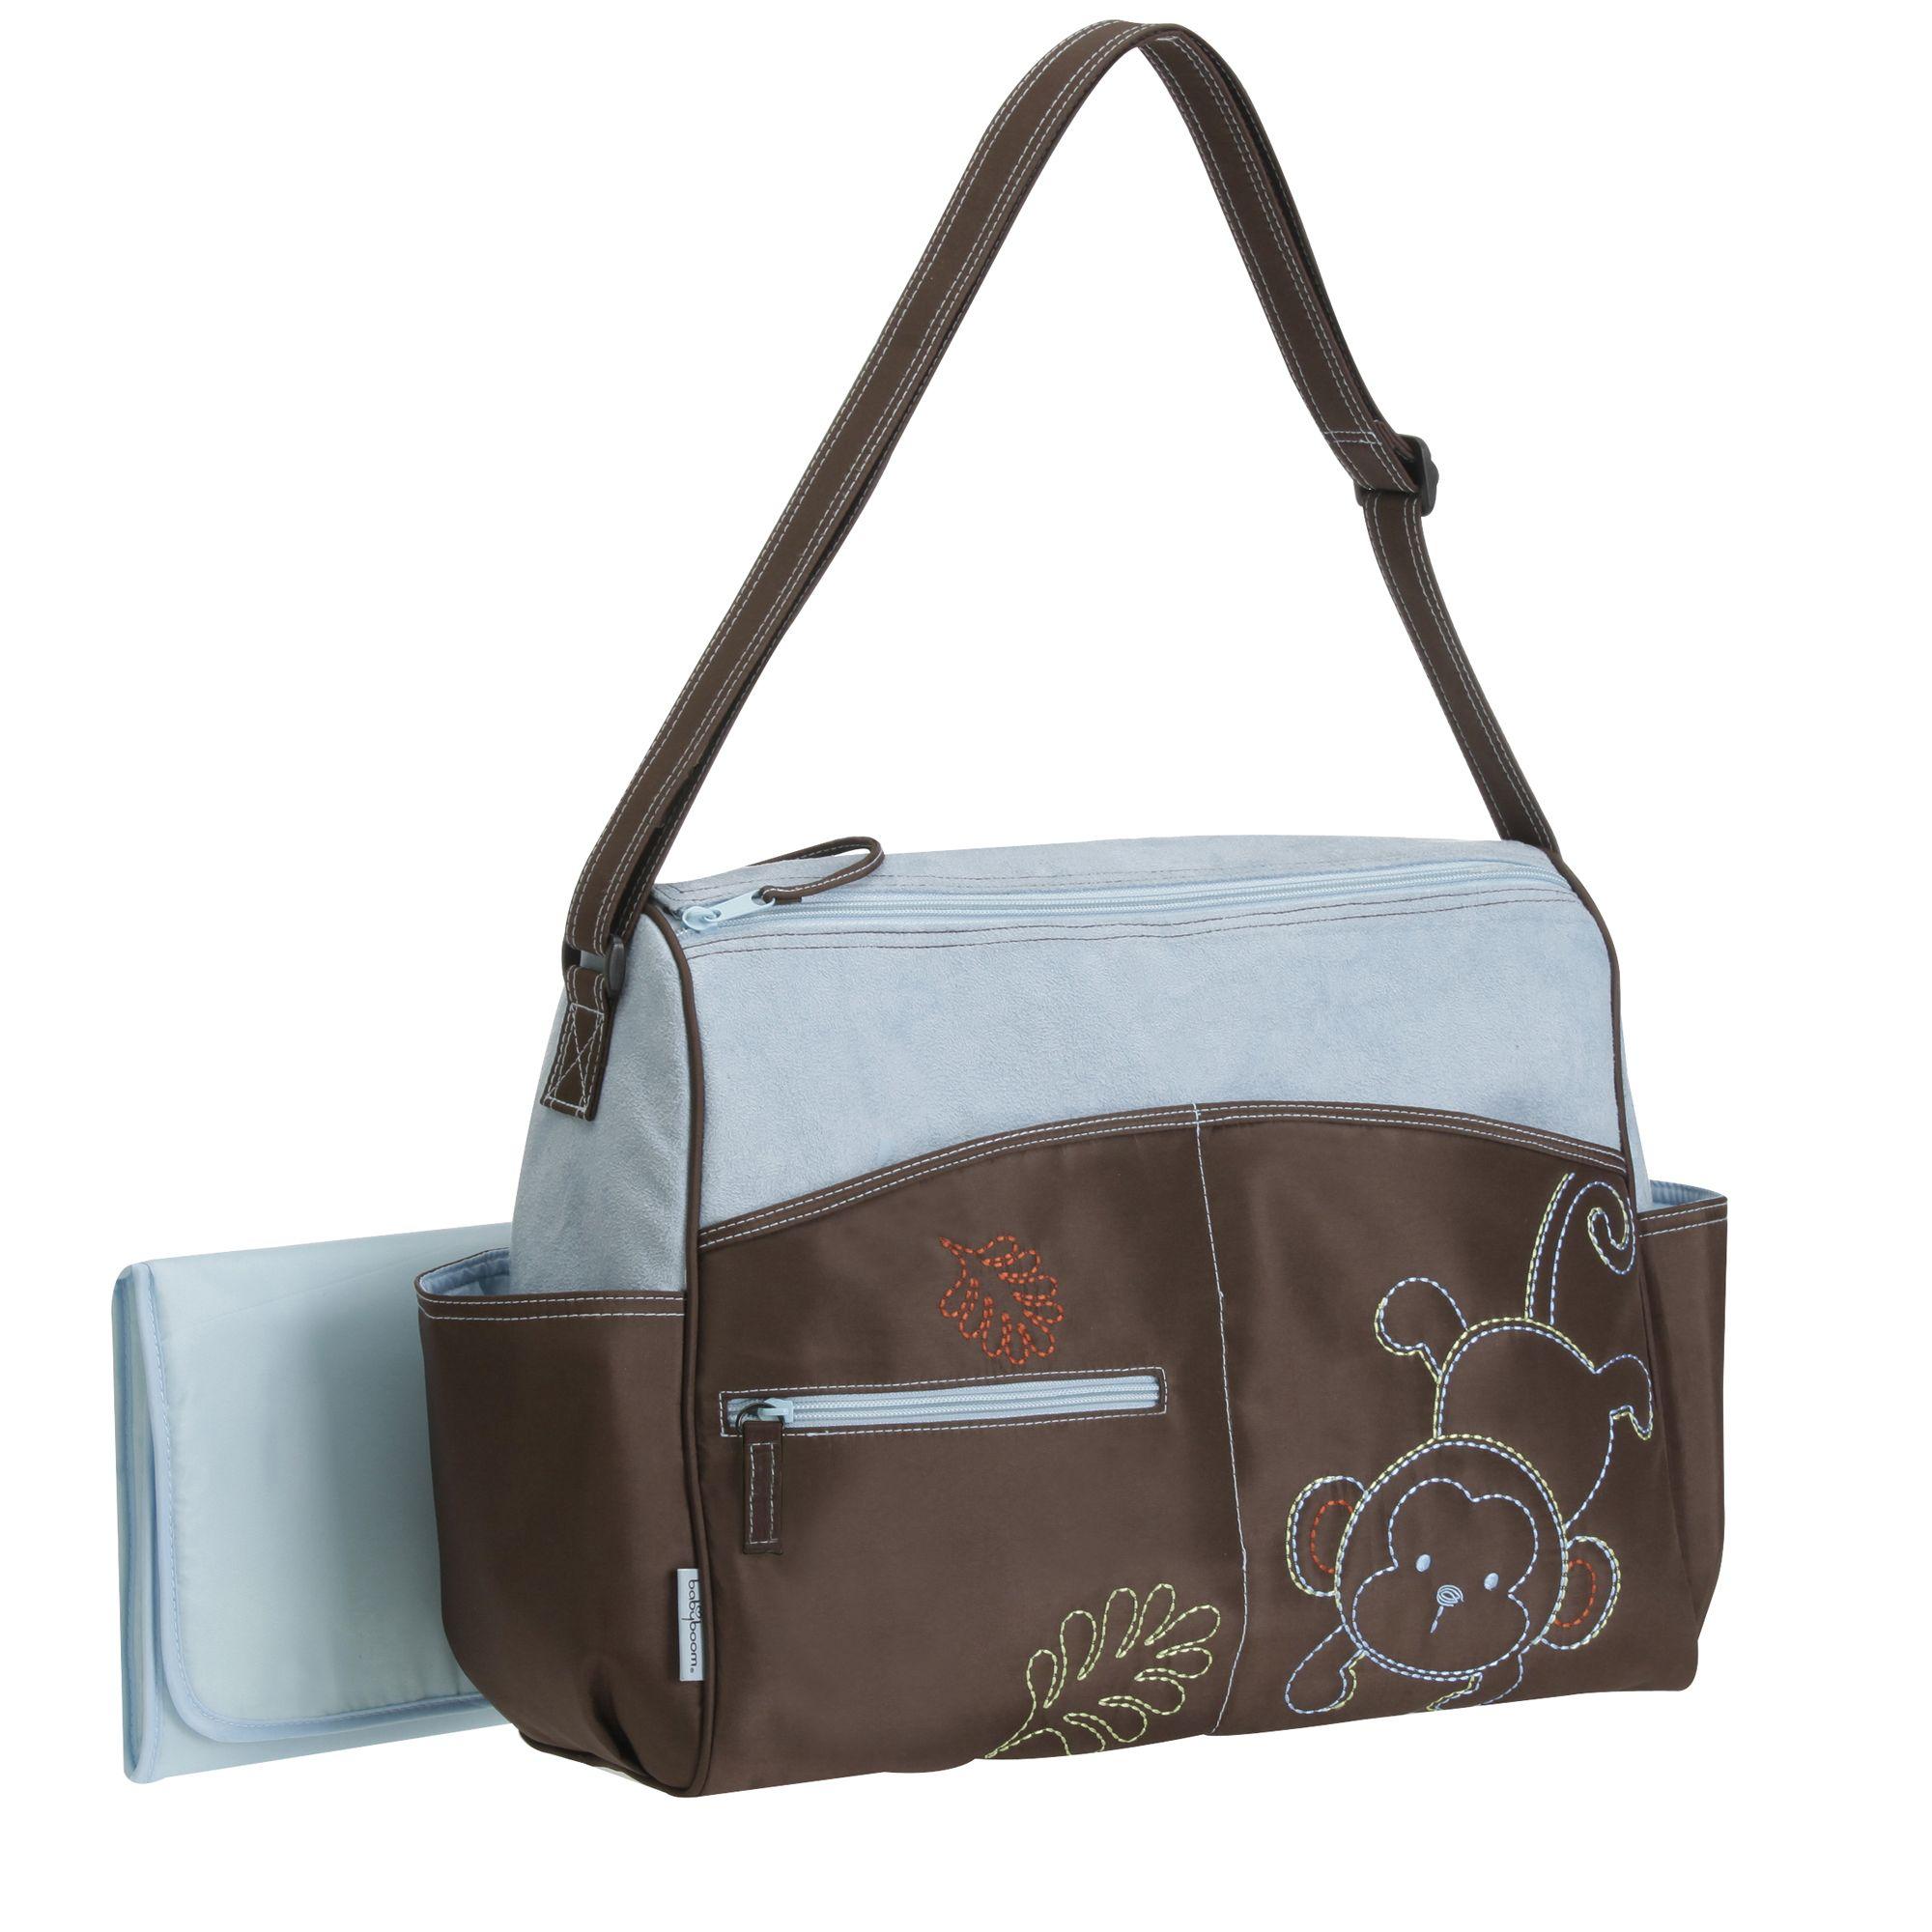 Baby Boom Duffle Diaper Bag - Monkey Embroidery